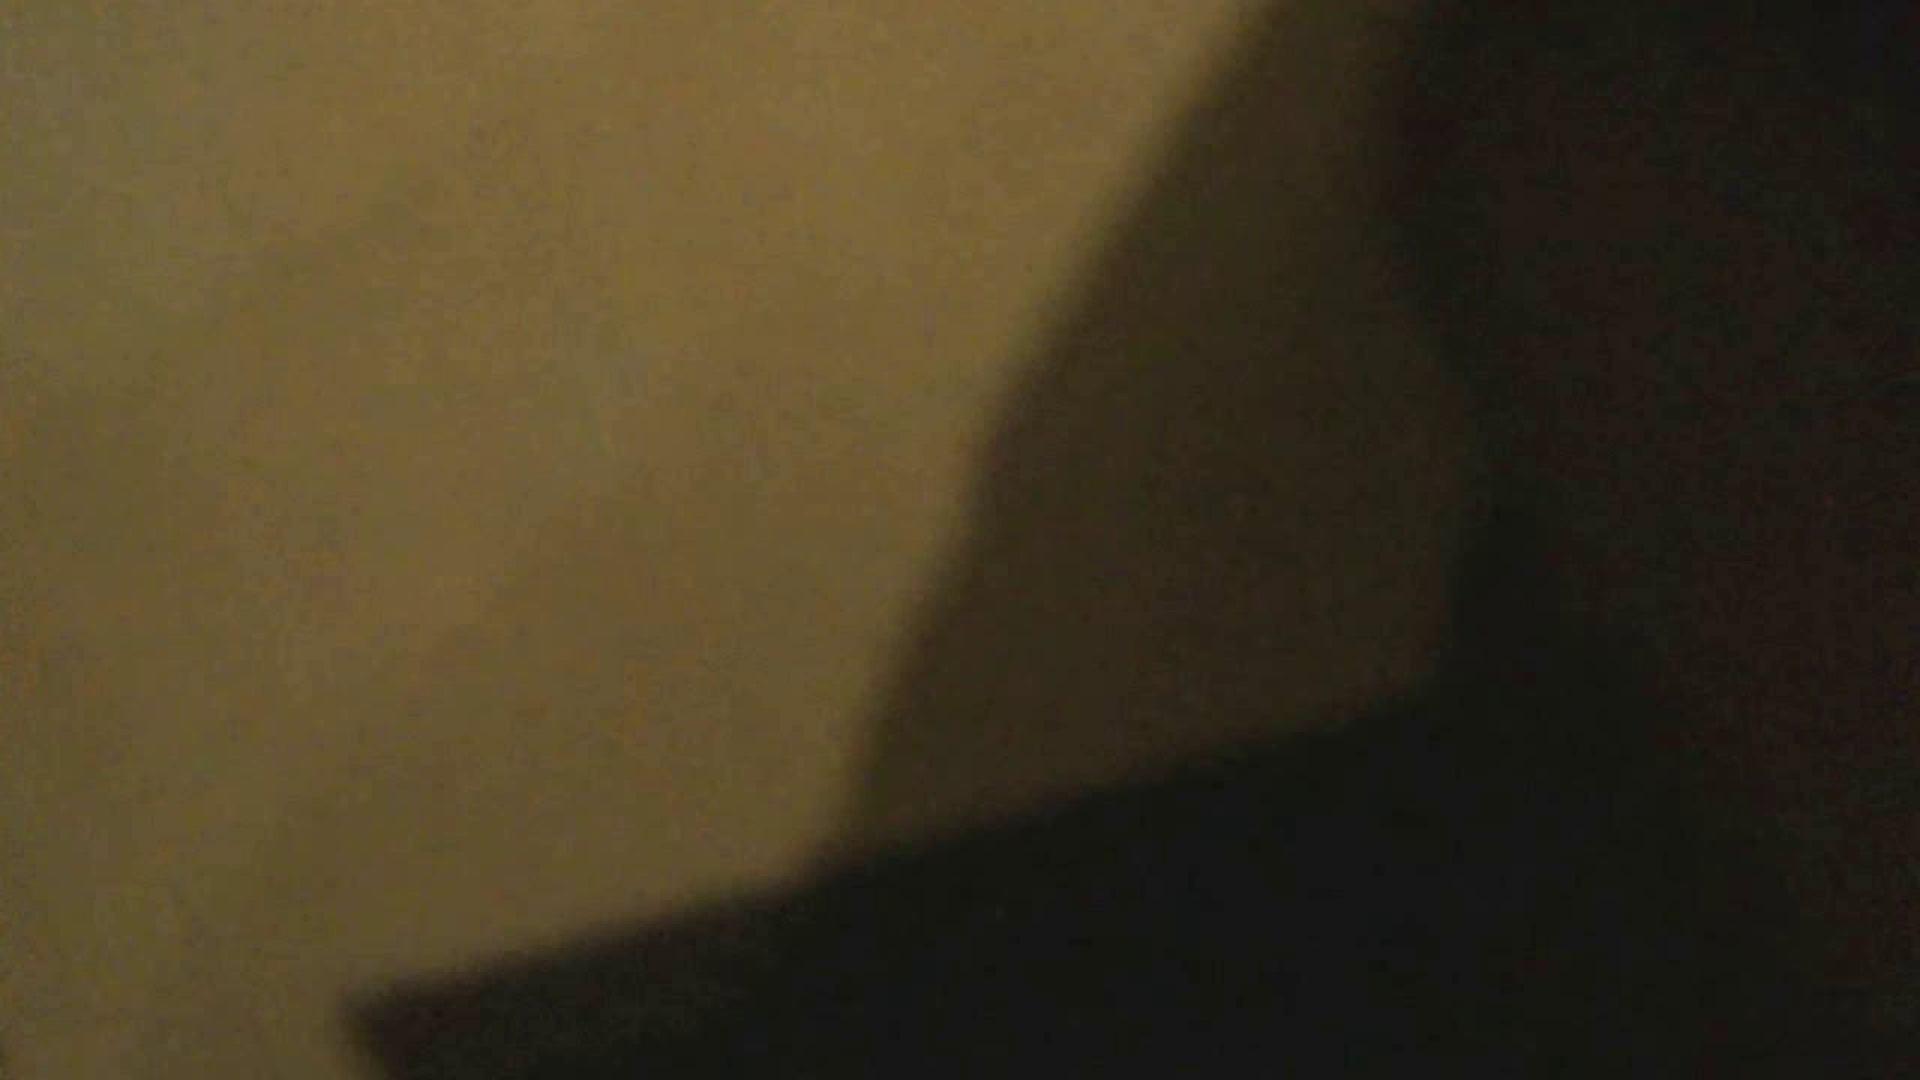 vol.10 【Sちゃん】現役女子大生19歳 クラブで知り合った友人 ギャルの実態 盗撮オマンコ無修正動画無料 45pic 44